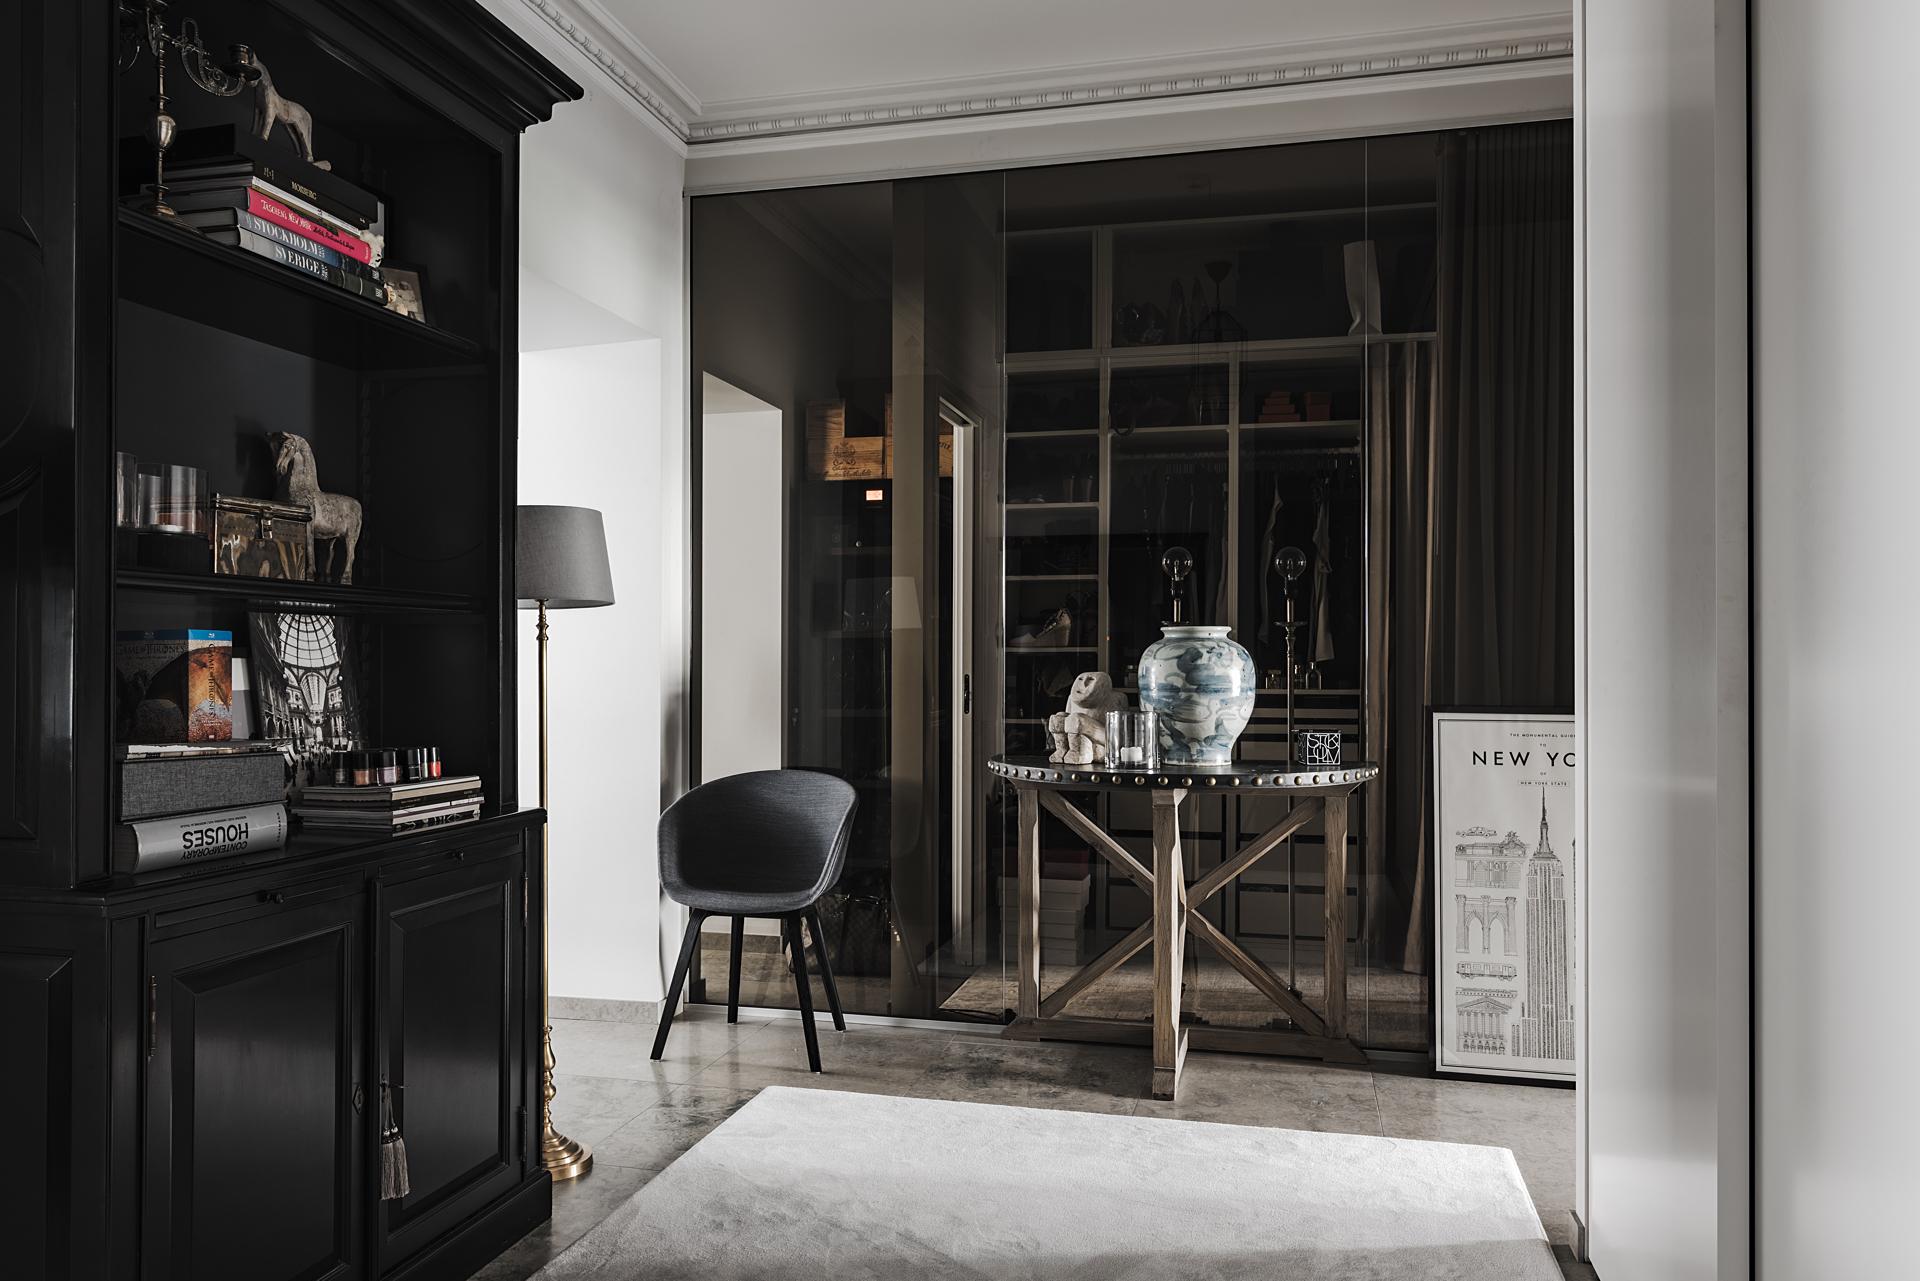 коридор стеклянная перегородка сервант столик ваза ковер